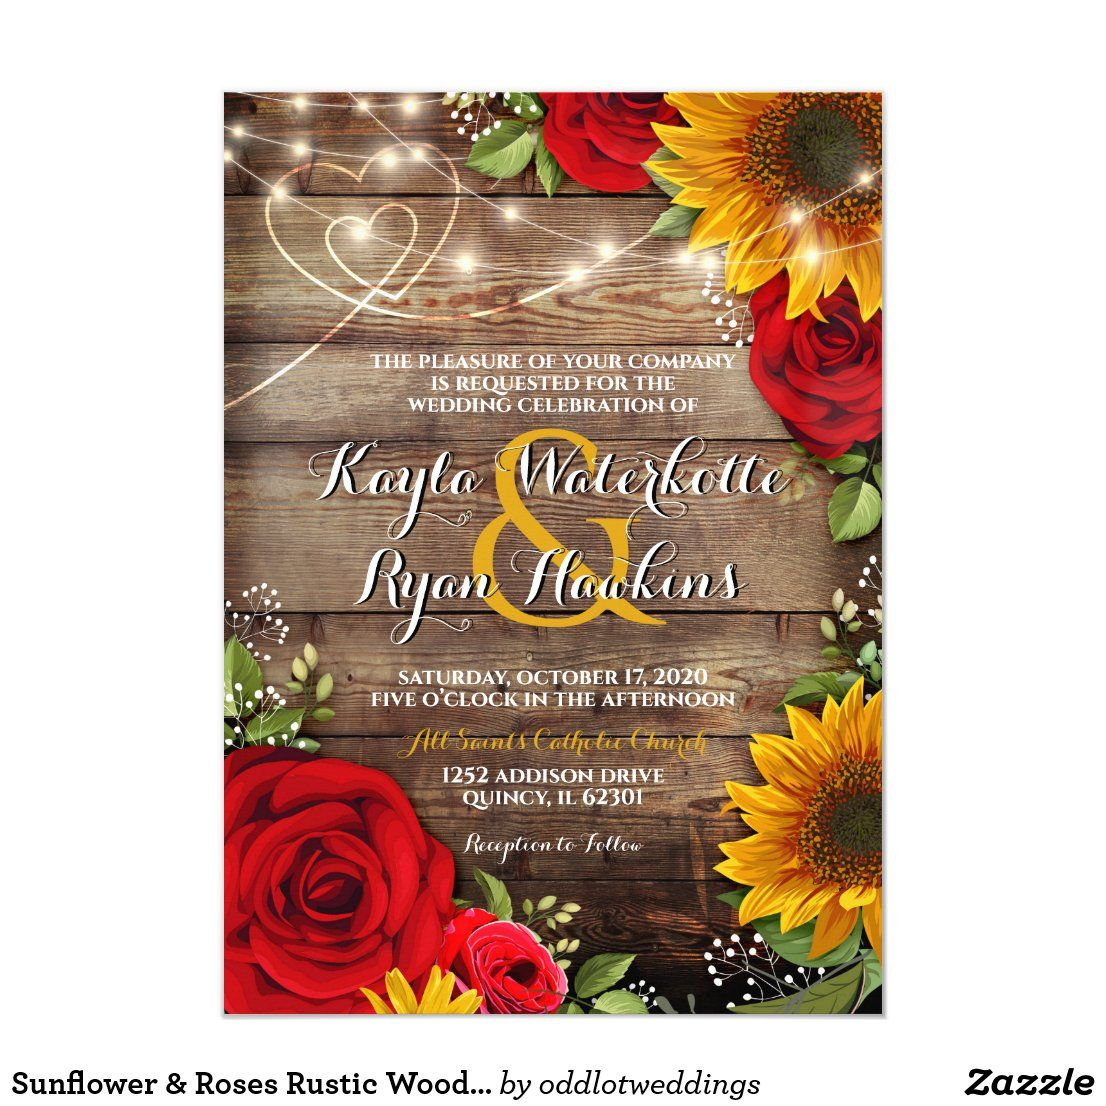 Sunflower & Roses Rustic Wood Lights Invitation Zazzle